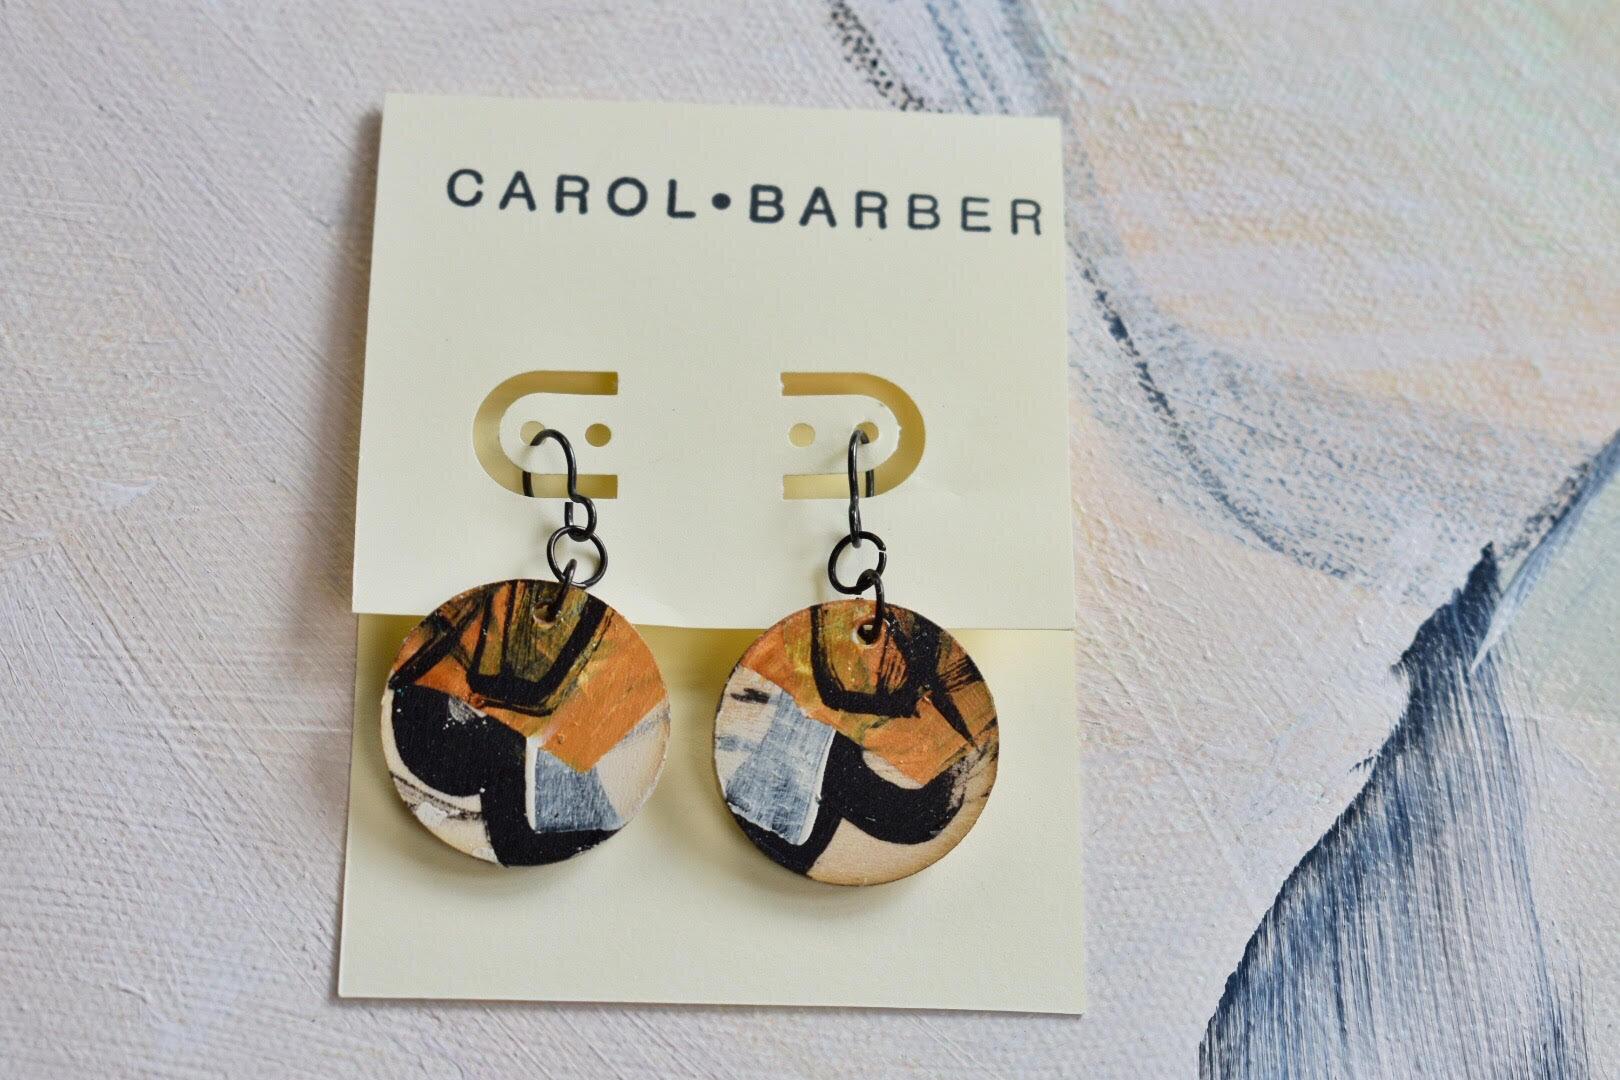 Barber_Carol1.jpg